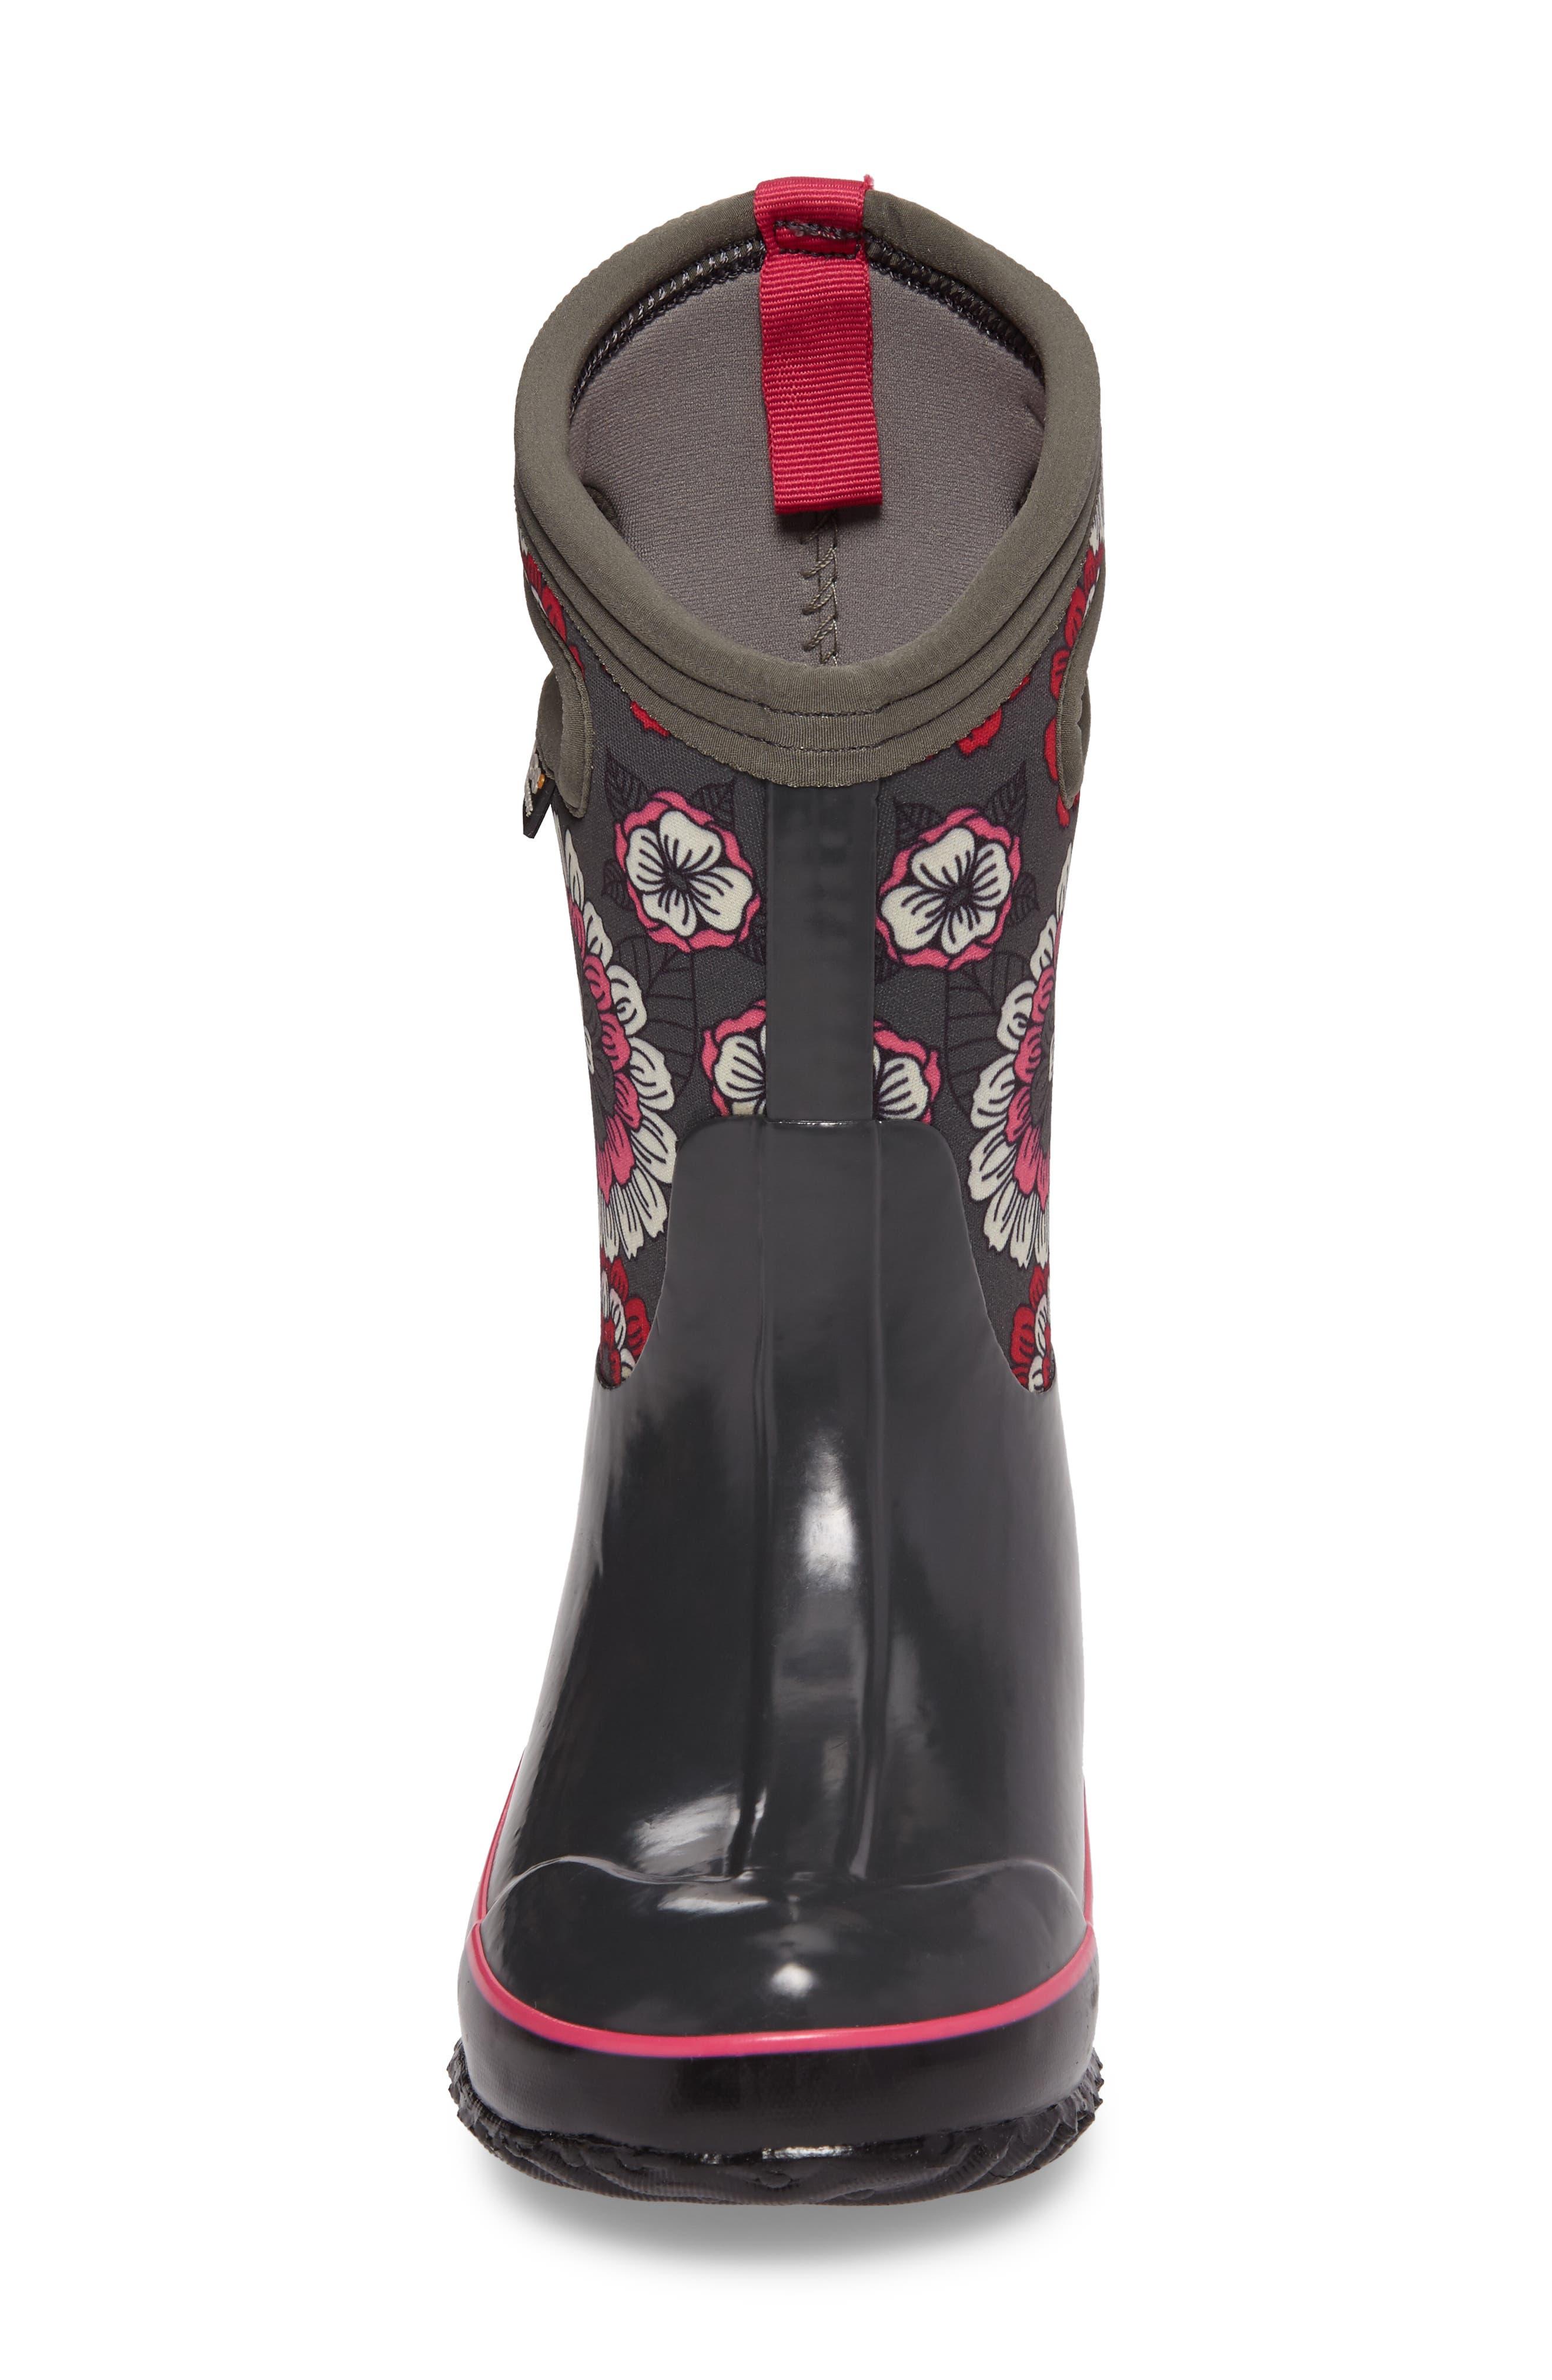 Classic Pansies Insulated Waterproof Boot,                             Alternate thumbnail 4, color,                             DARK GRAY MULTI